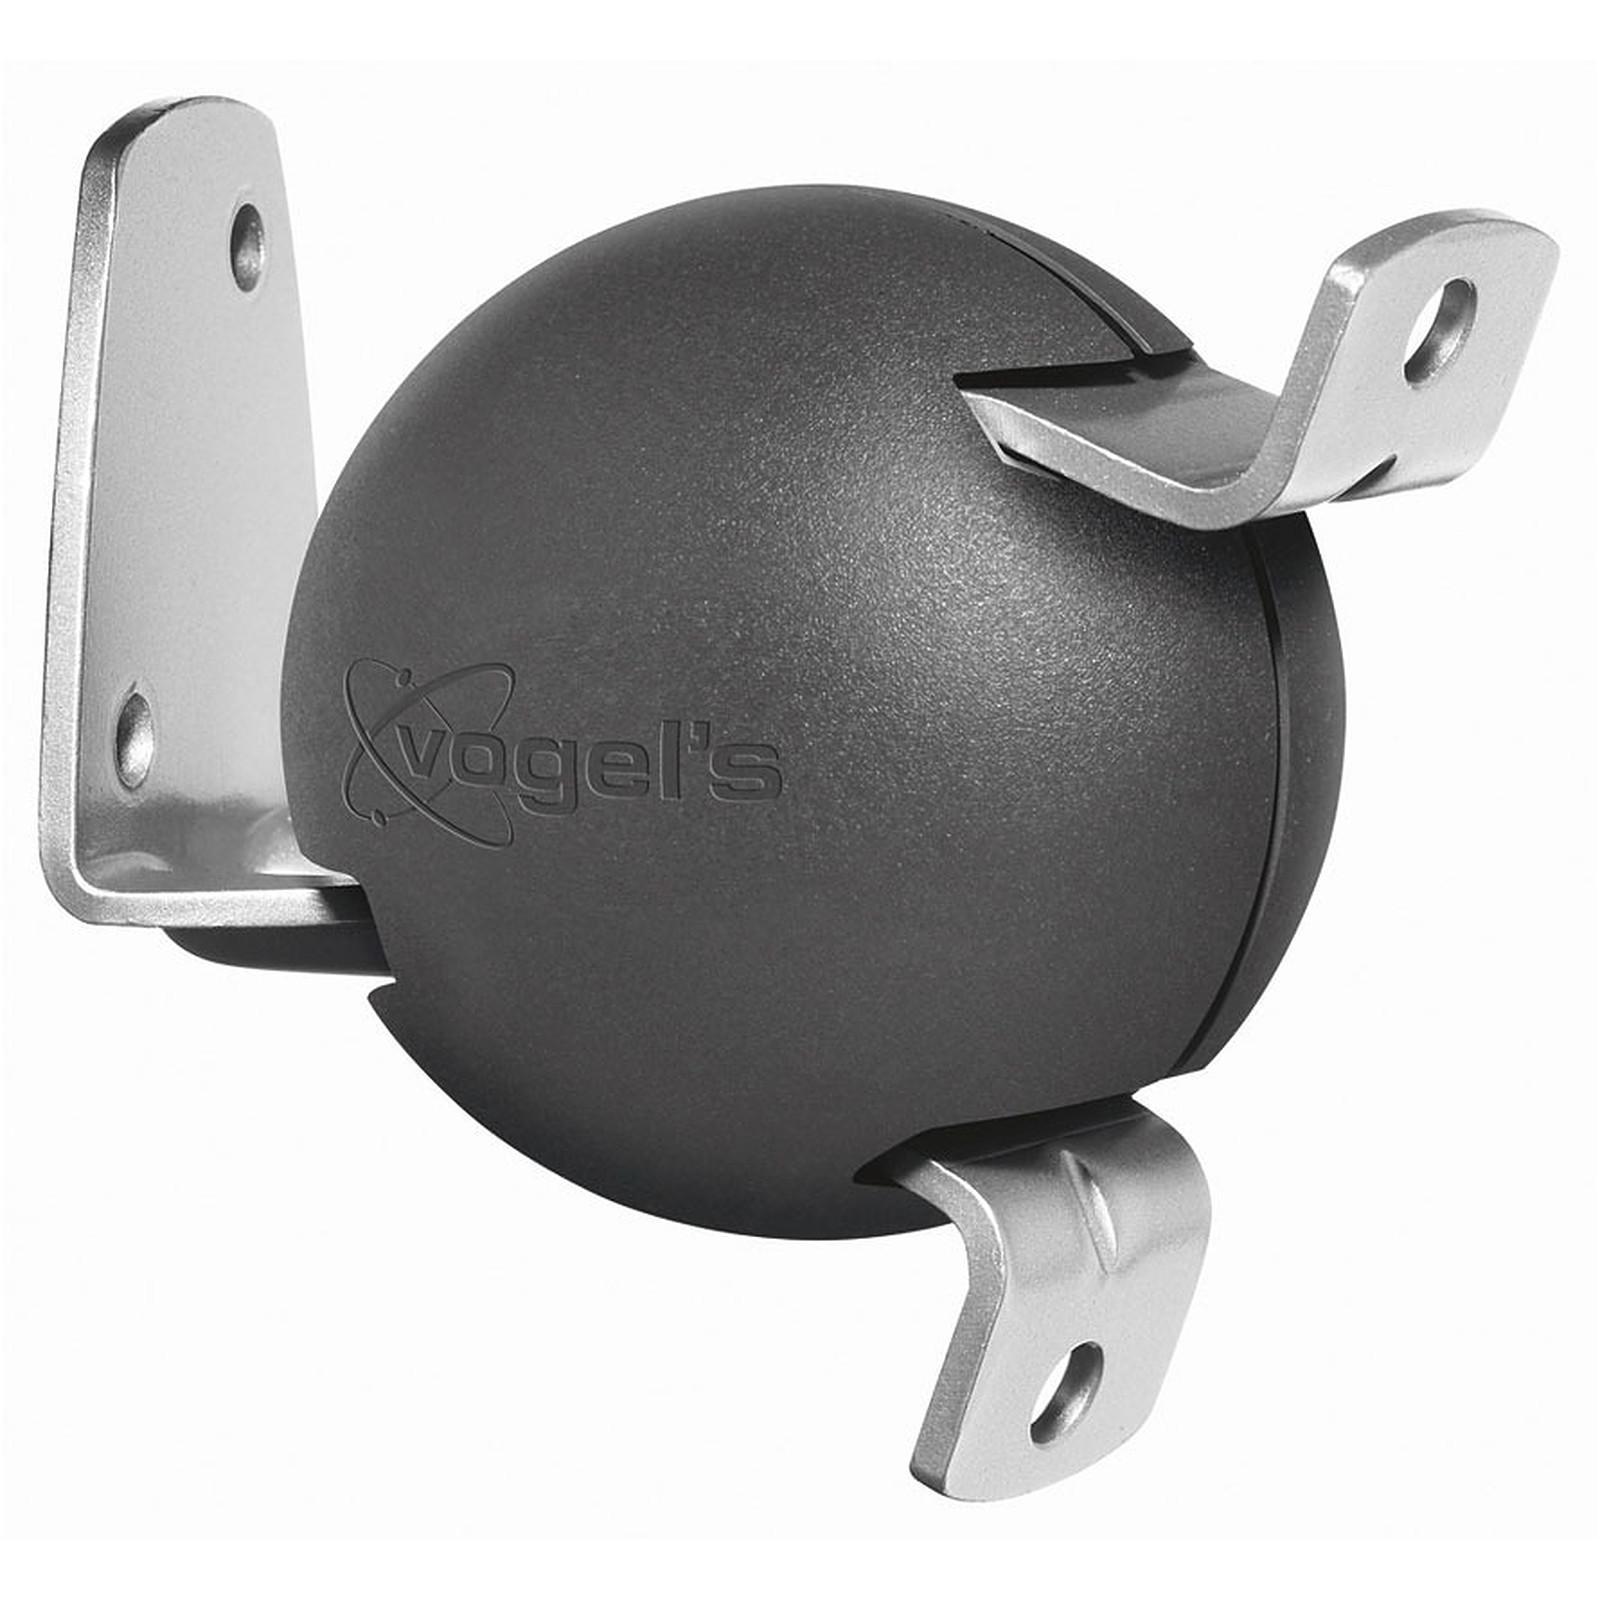 Vogel's ELW 6605